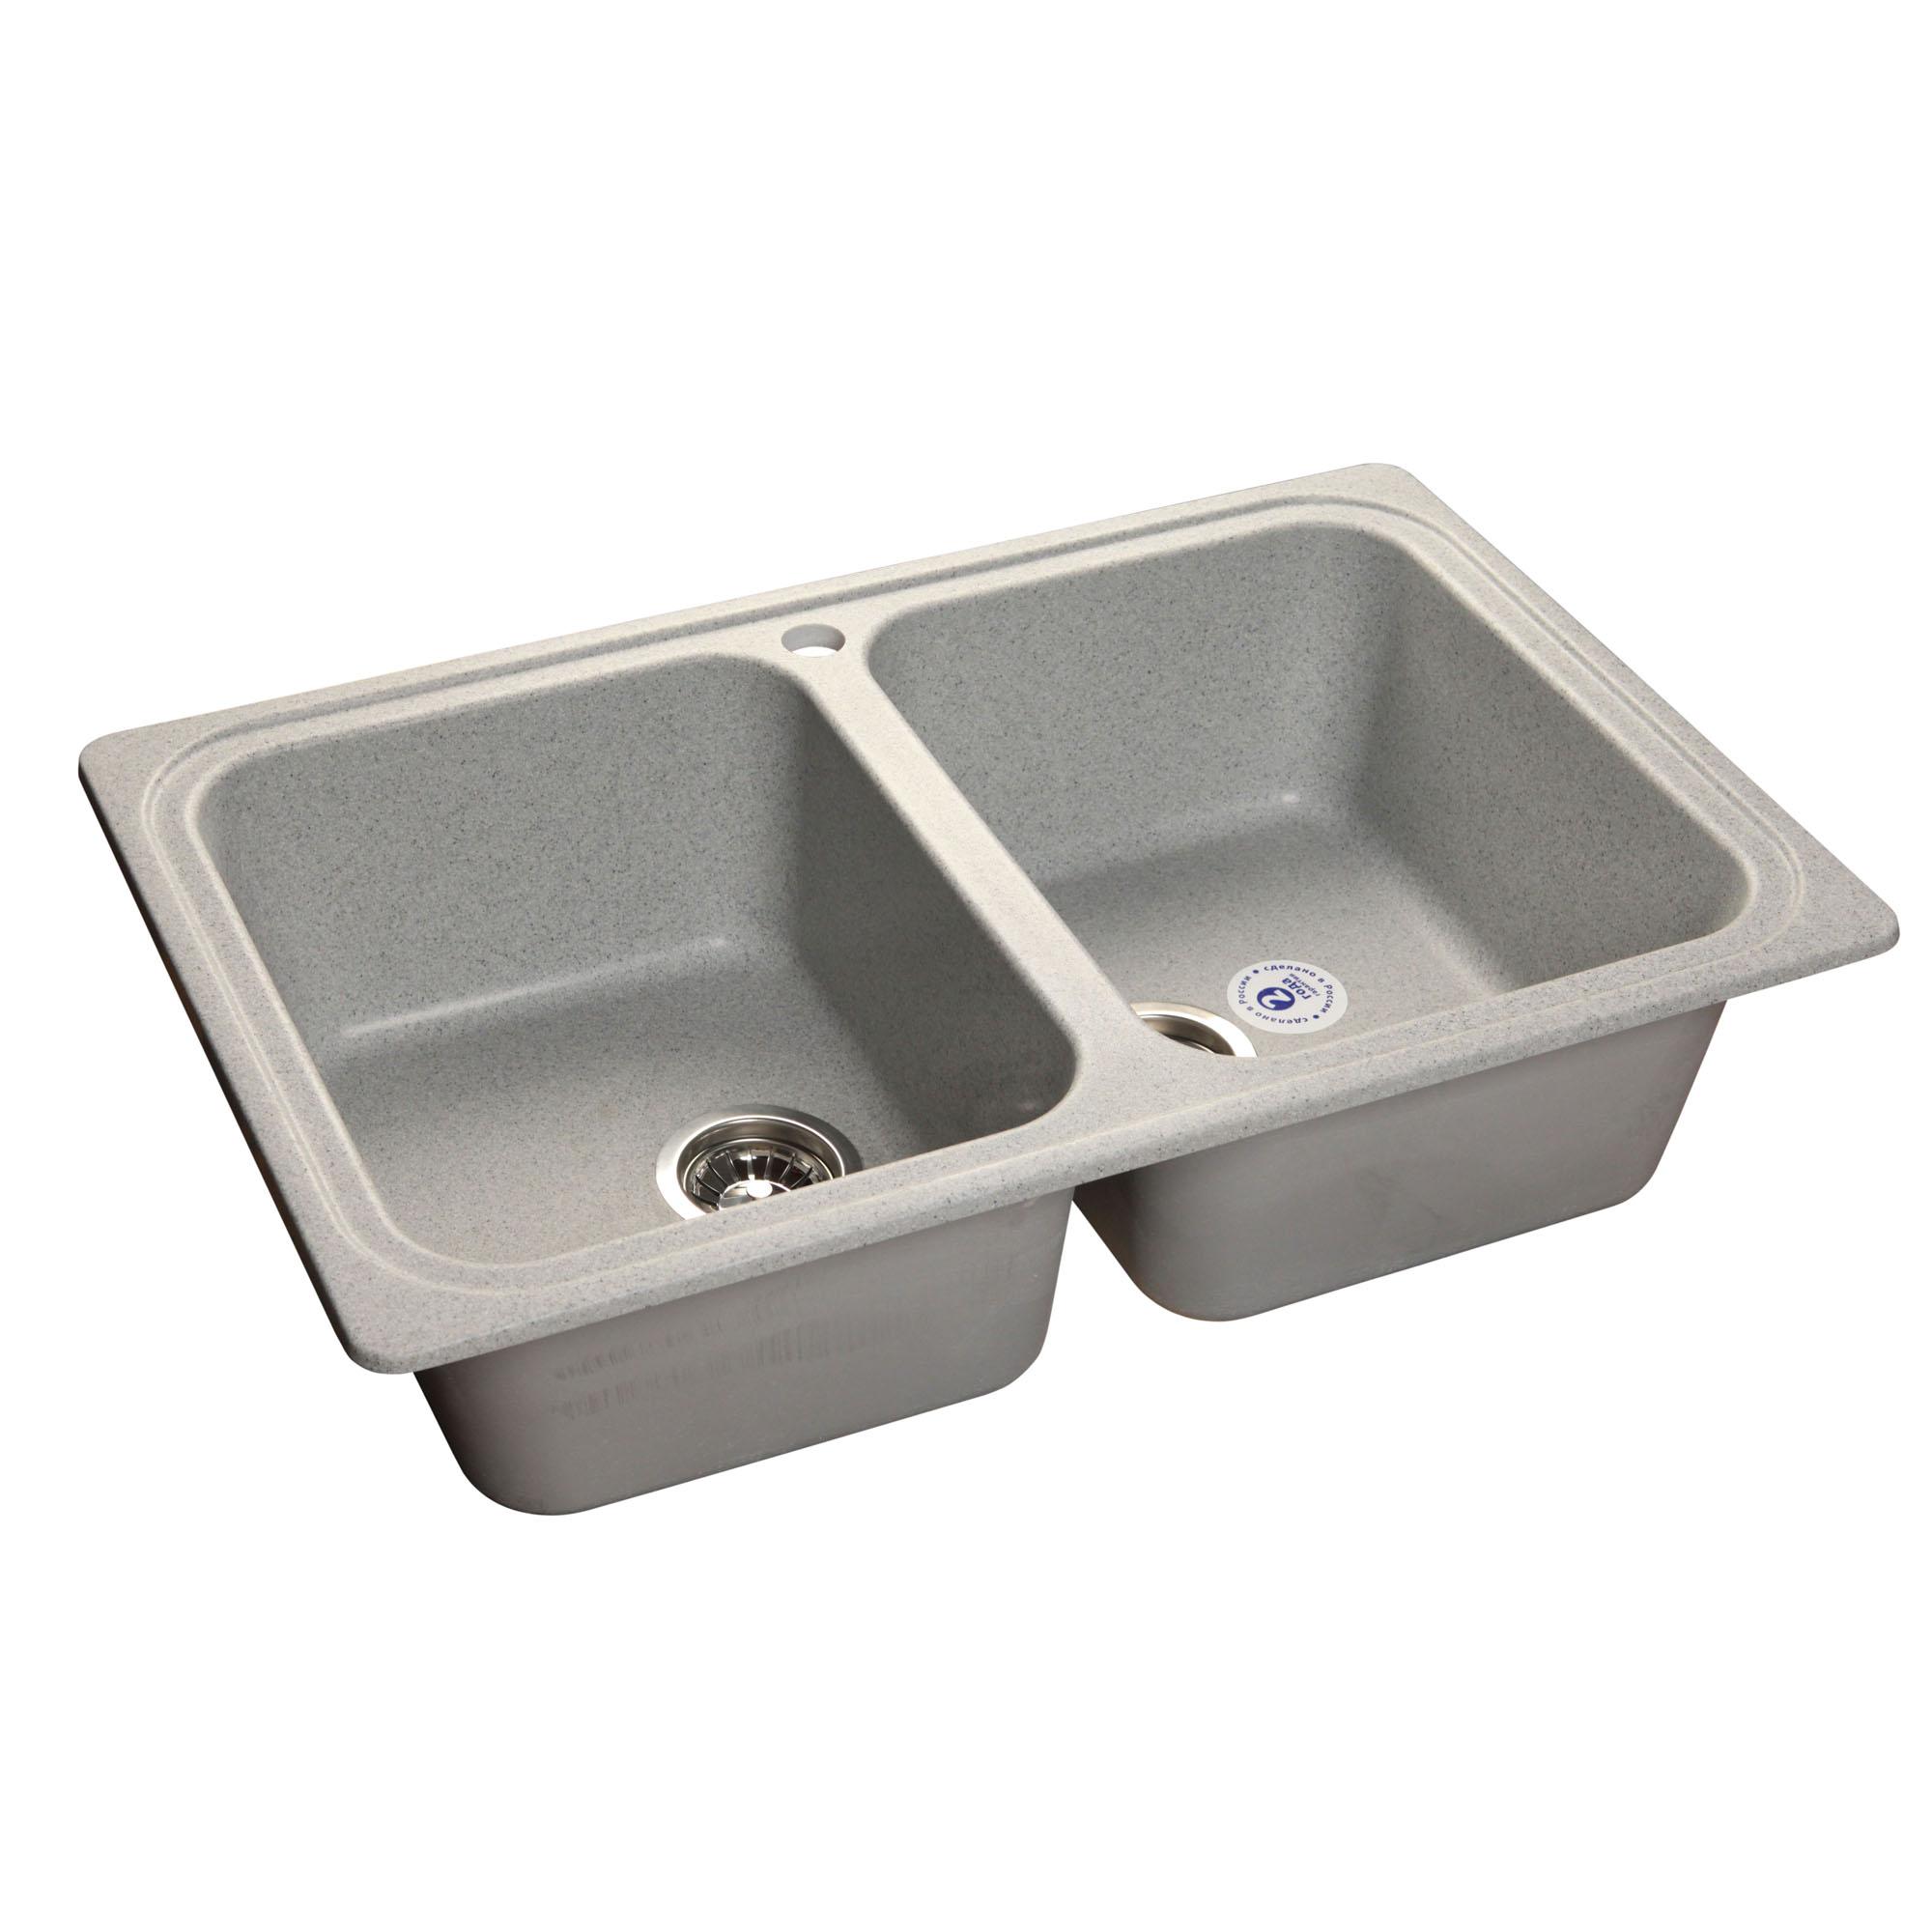 Кухонная мойка GranFest Standart GF-S780K серый мойка кухонная granfest гранит 780x510 gf s780k бежевая